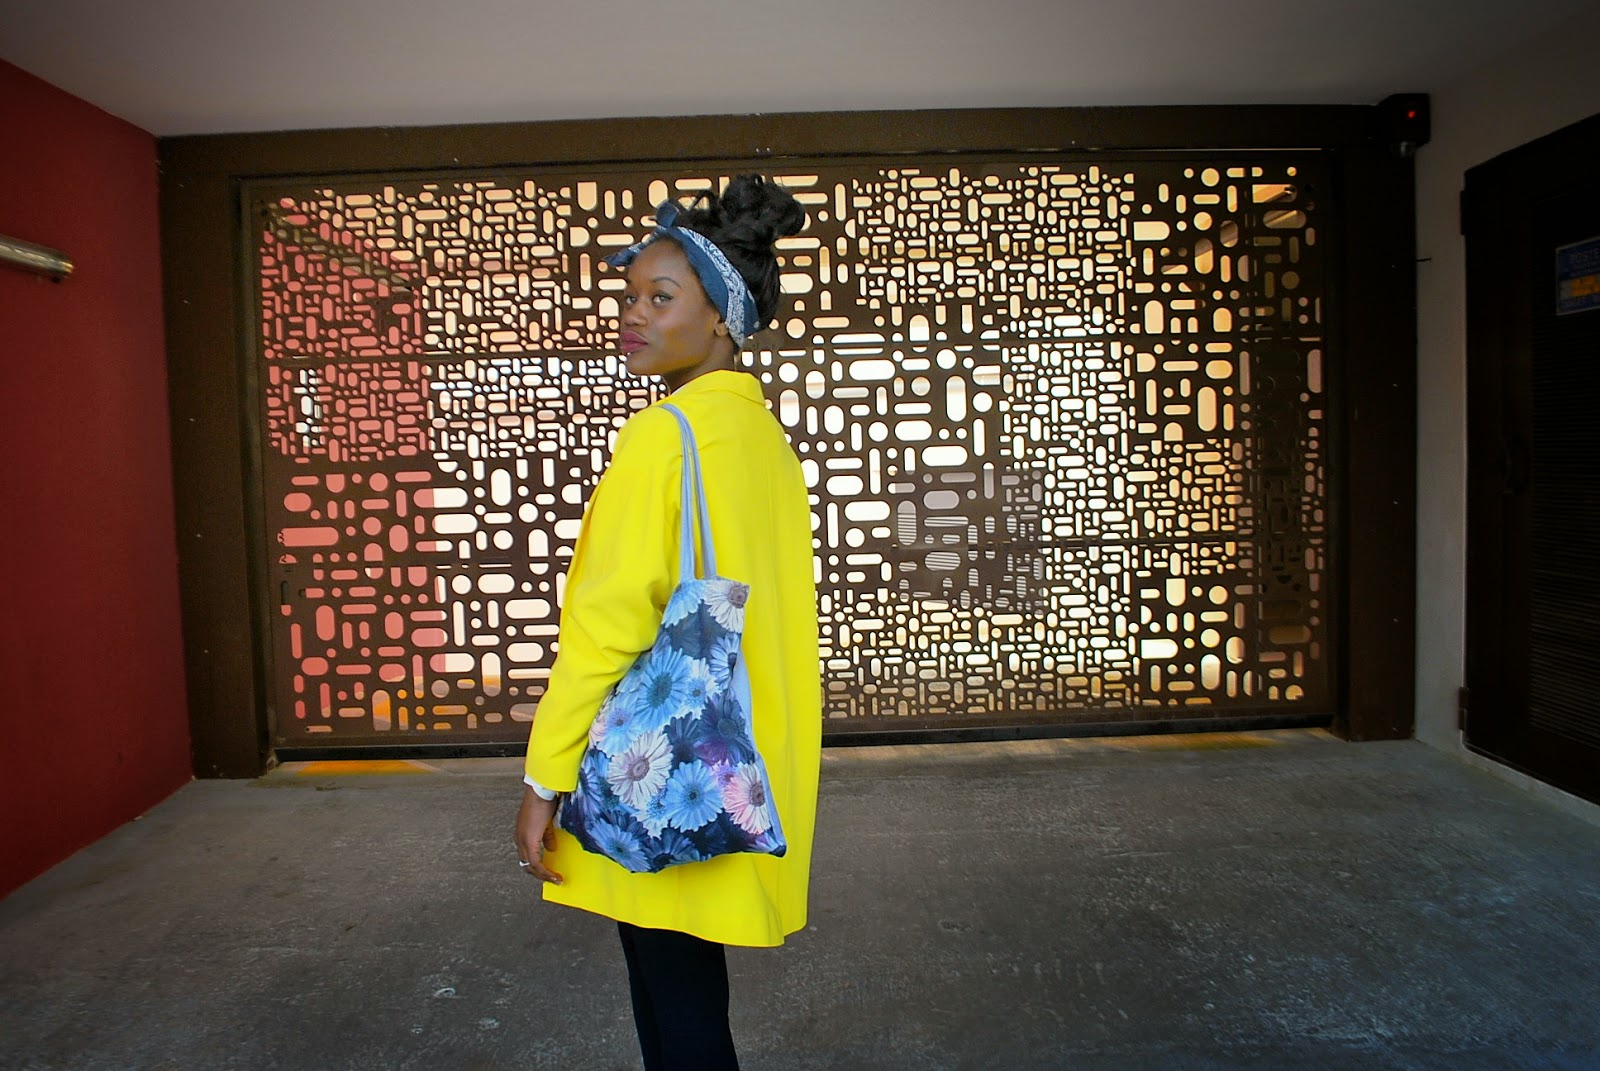 veste jaune primark, headband, tote bag fleurs bleues